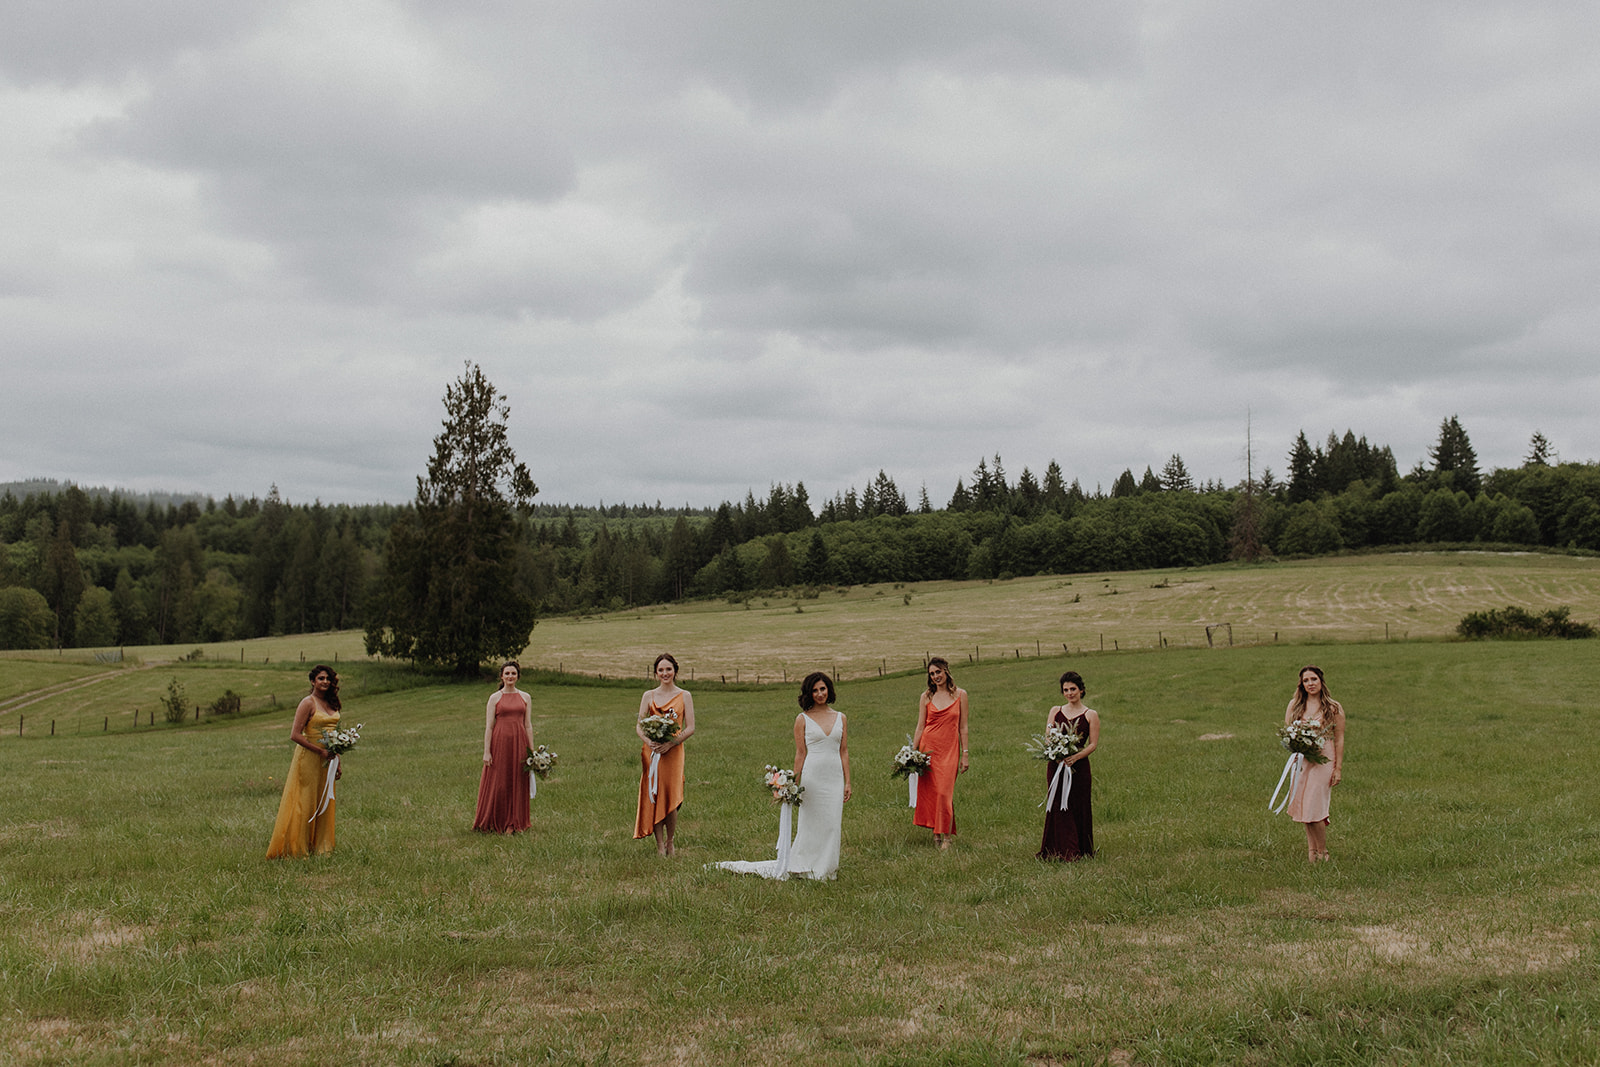 cortney_skye_wedding_june2019-206.jpg